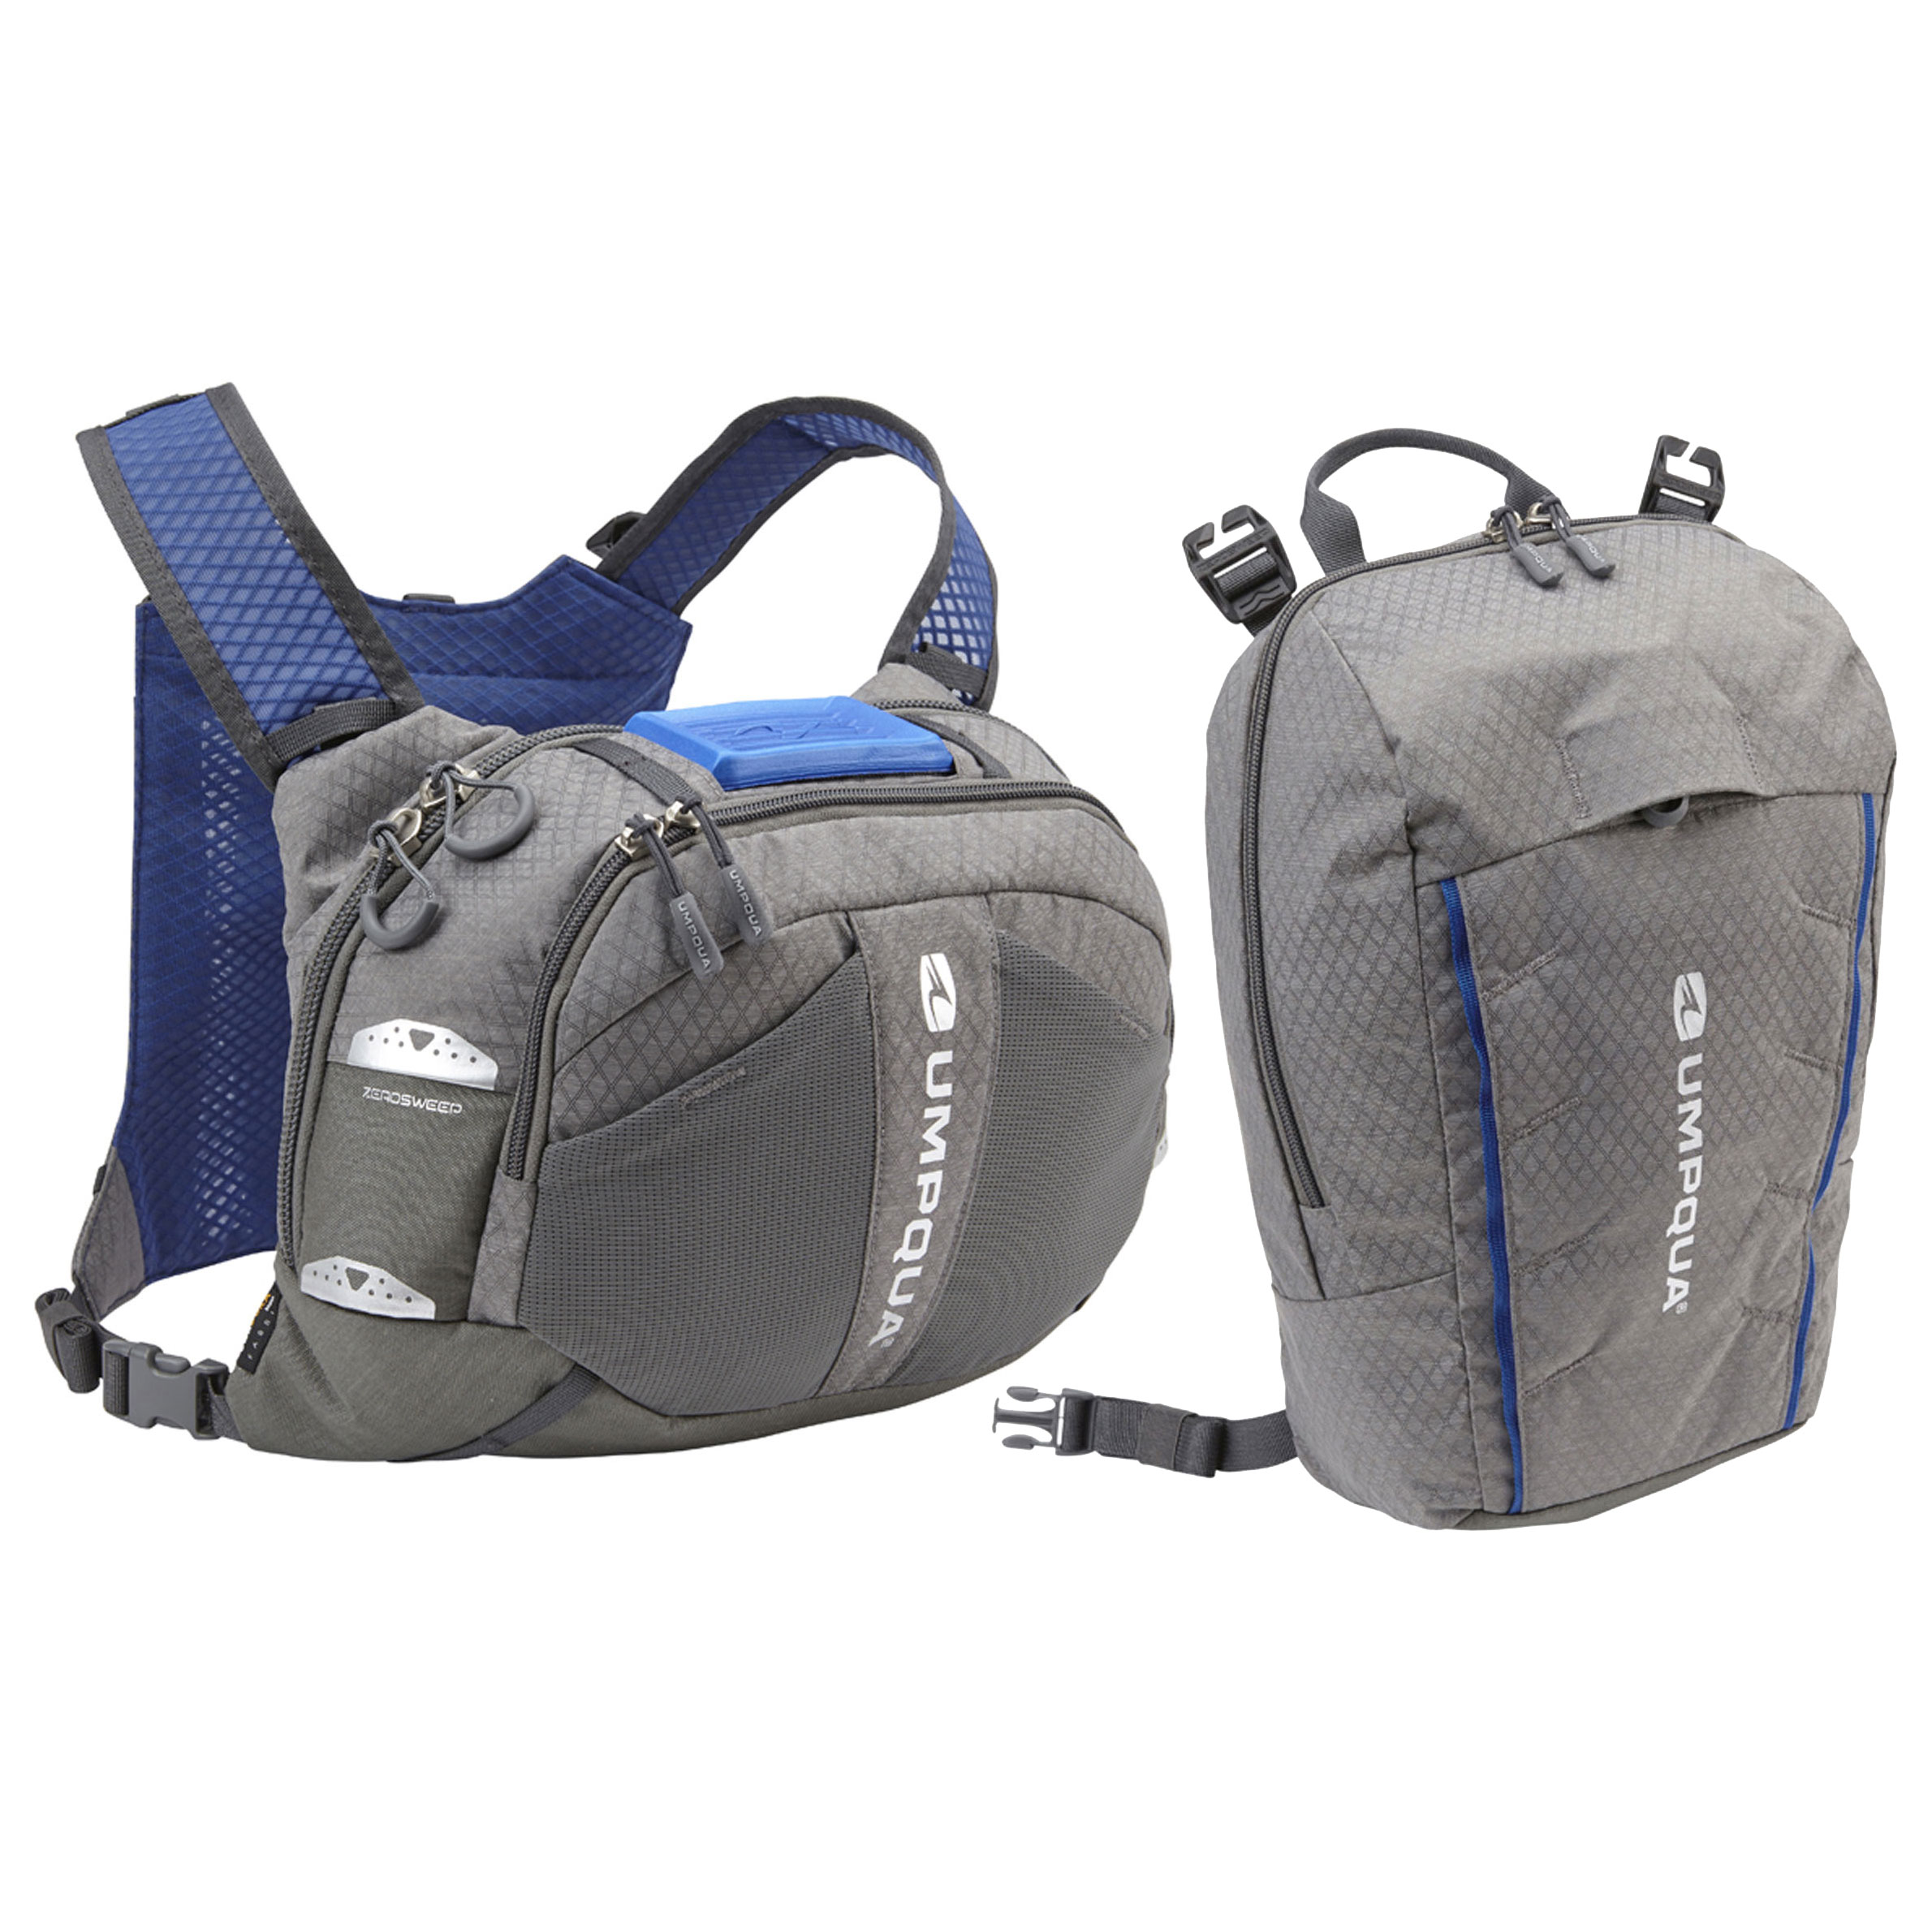 Umpqua overlook 500 zero sweep chest pack fly fishing kit for Fishing bags walmart